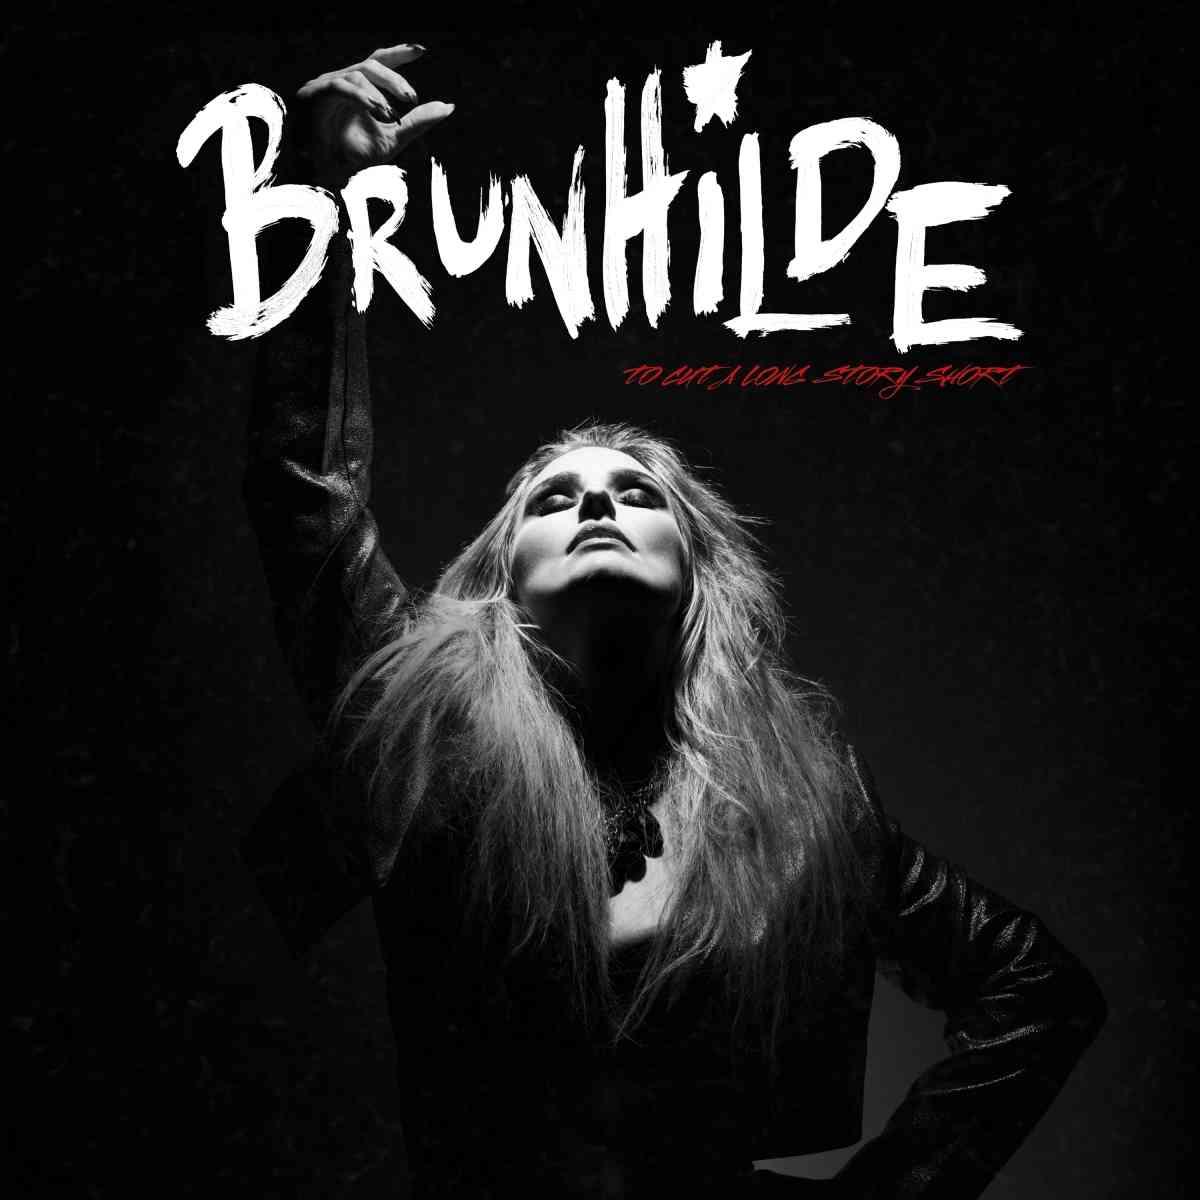 Brunhilde - To Cut A Long Story Short - album cover